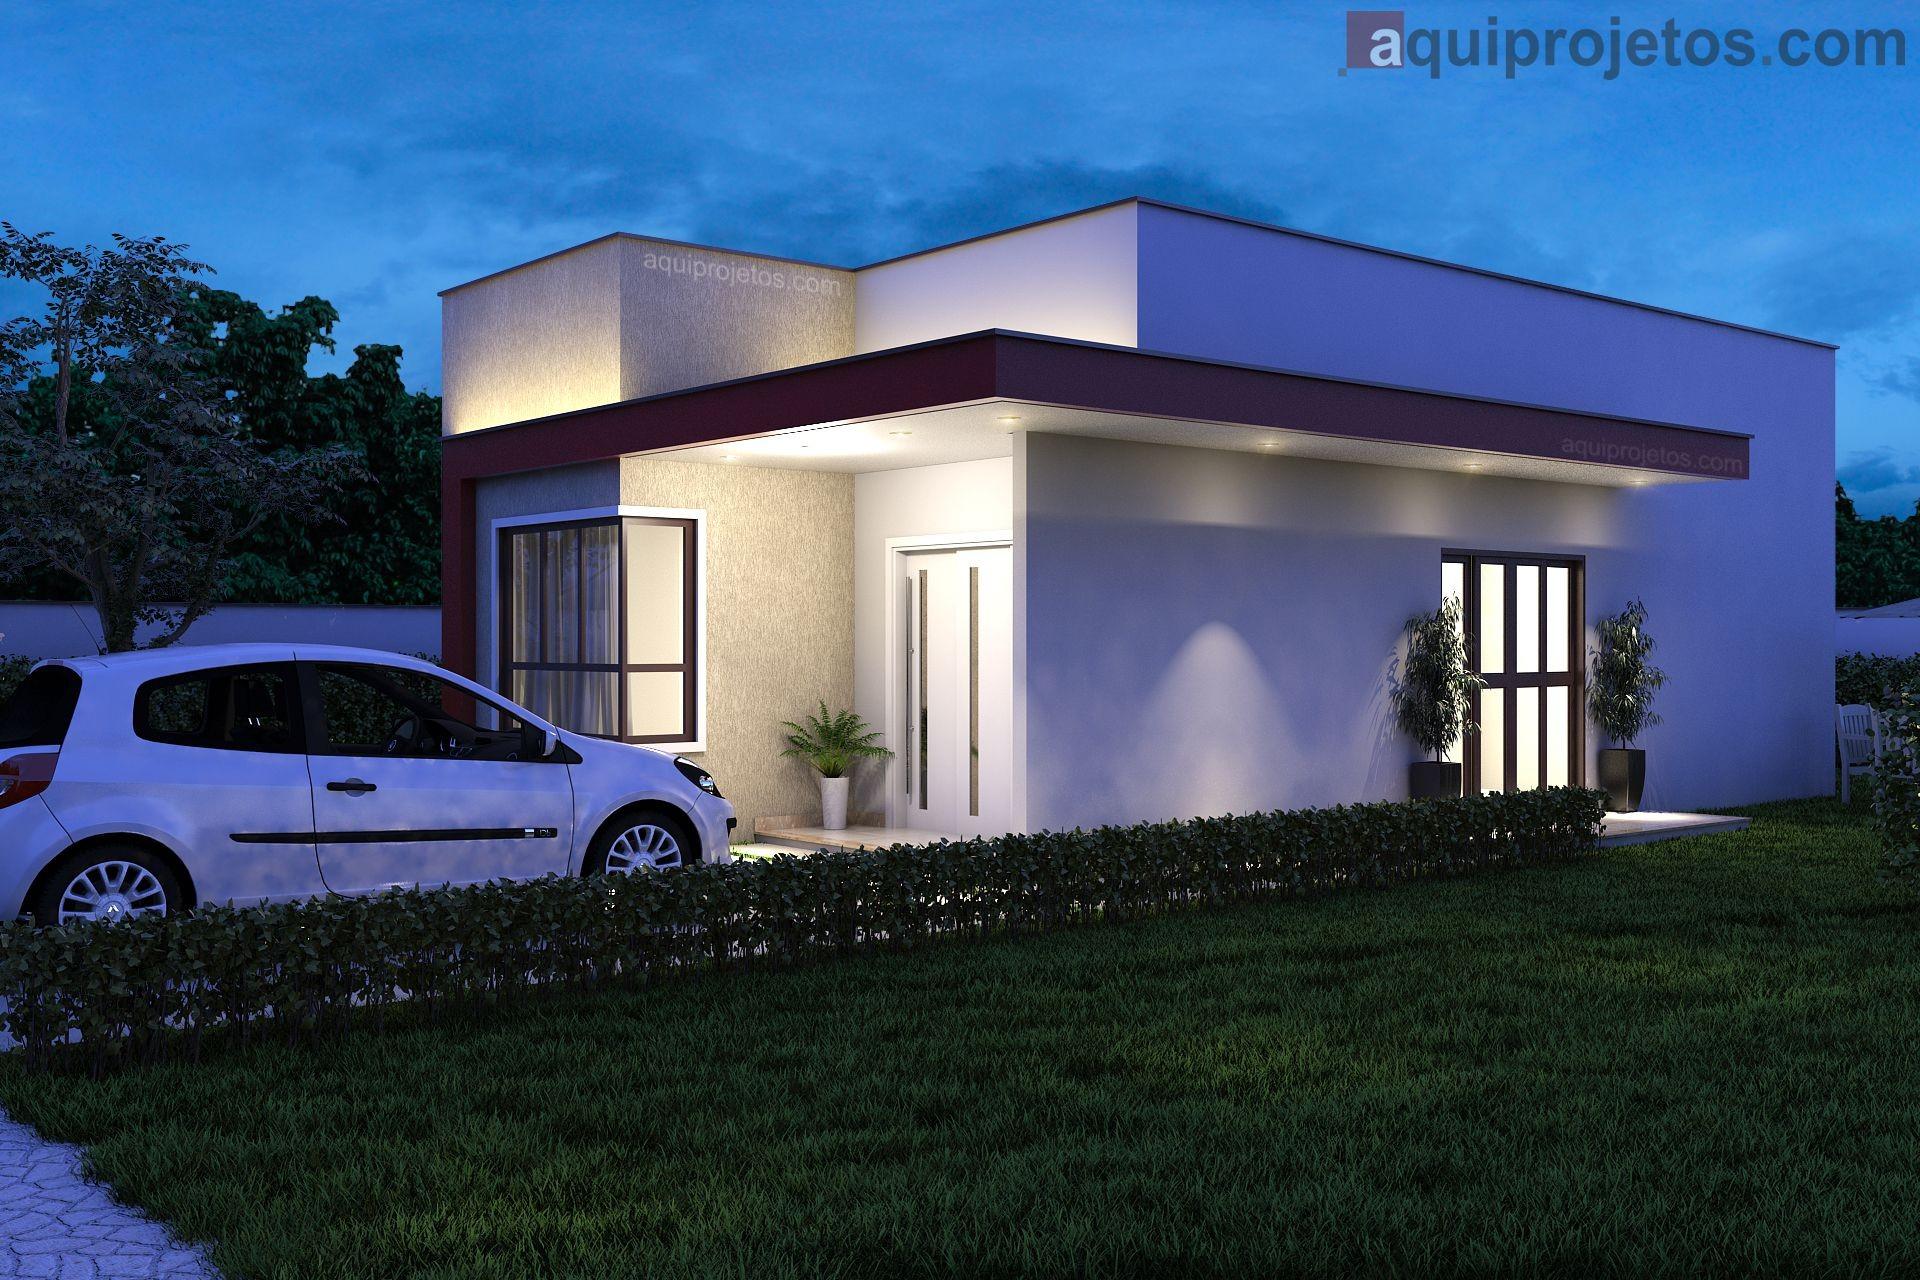 Fachada lateral noturna moderna casa de 1 pavimento - Projeto Maceió - Cod G13 – aquiprojetos